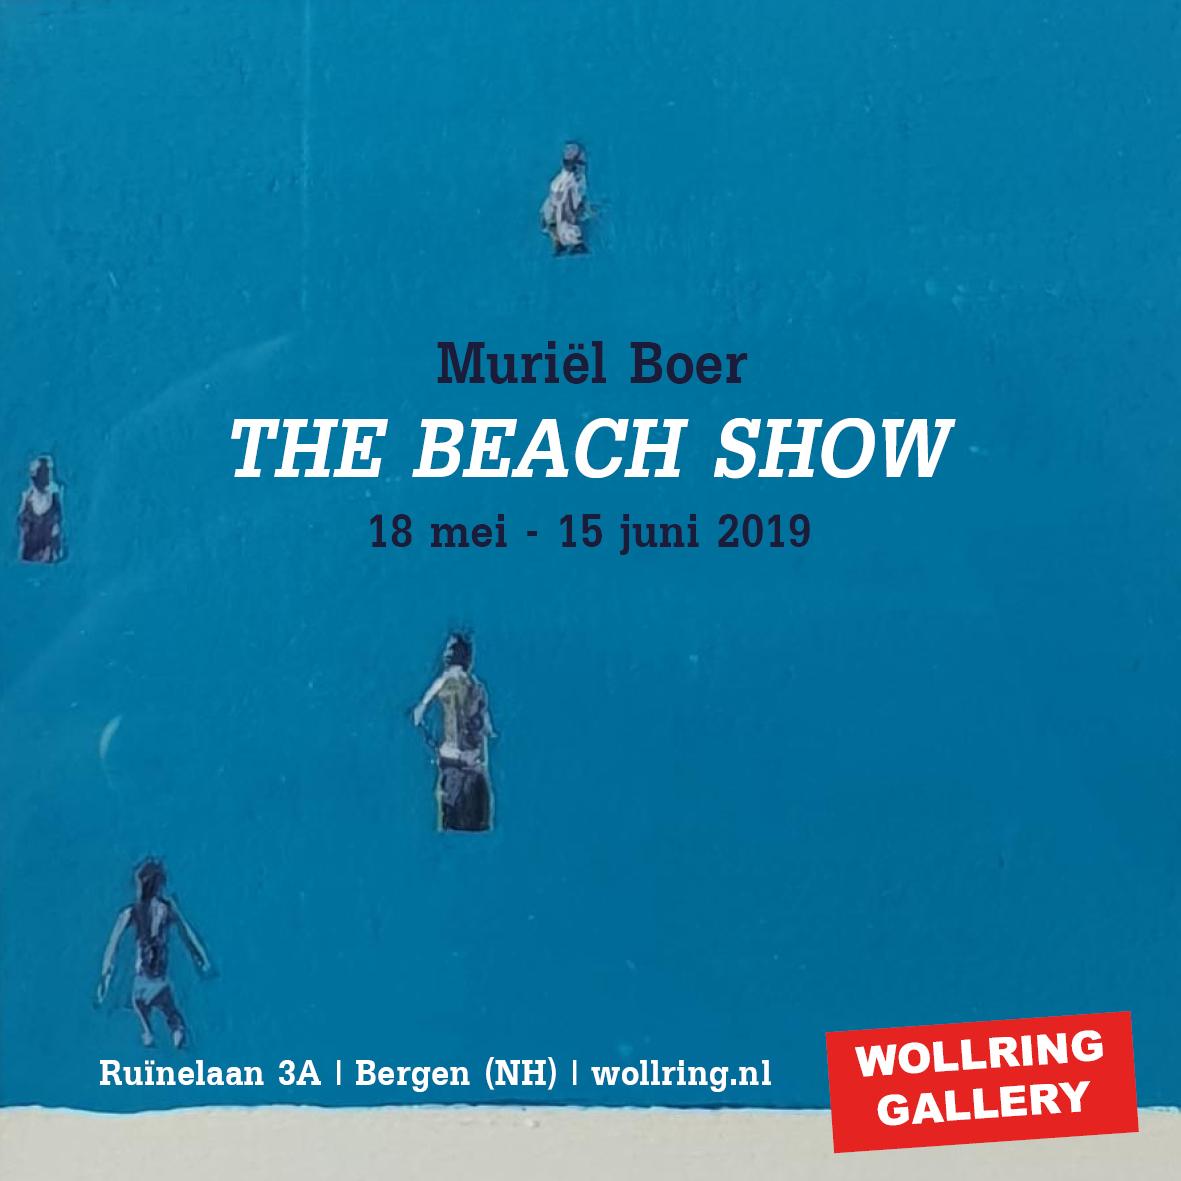 the beach show muriel boer